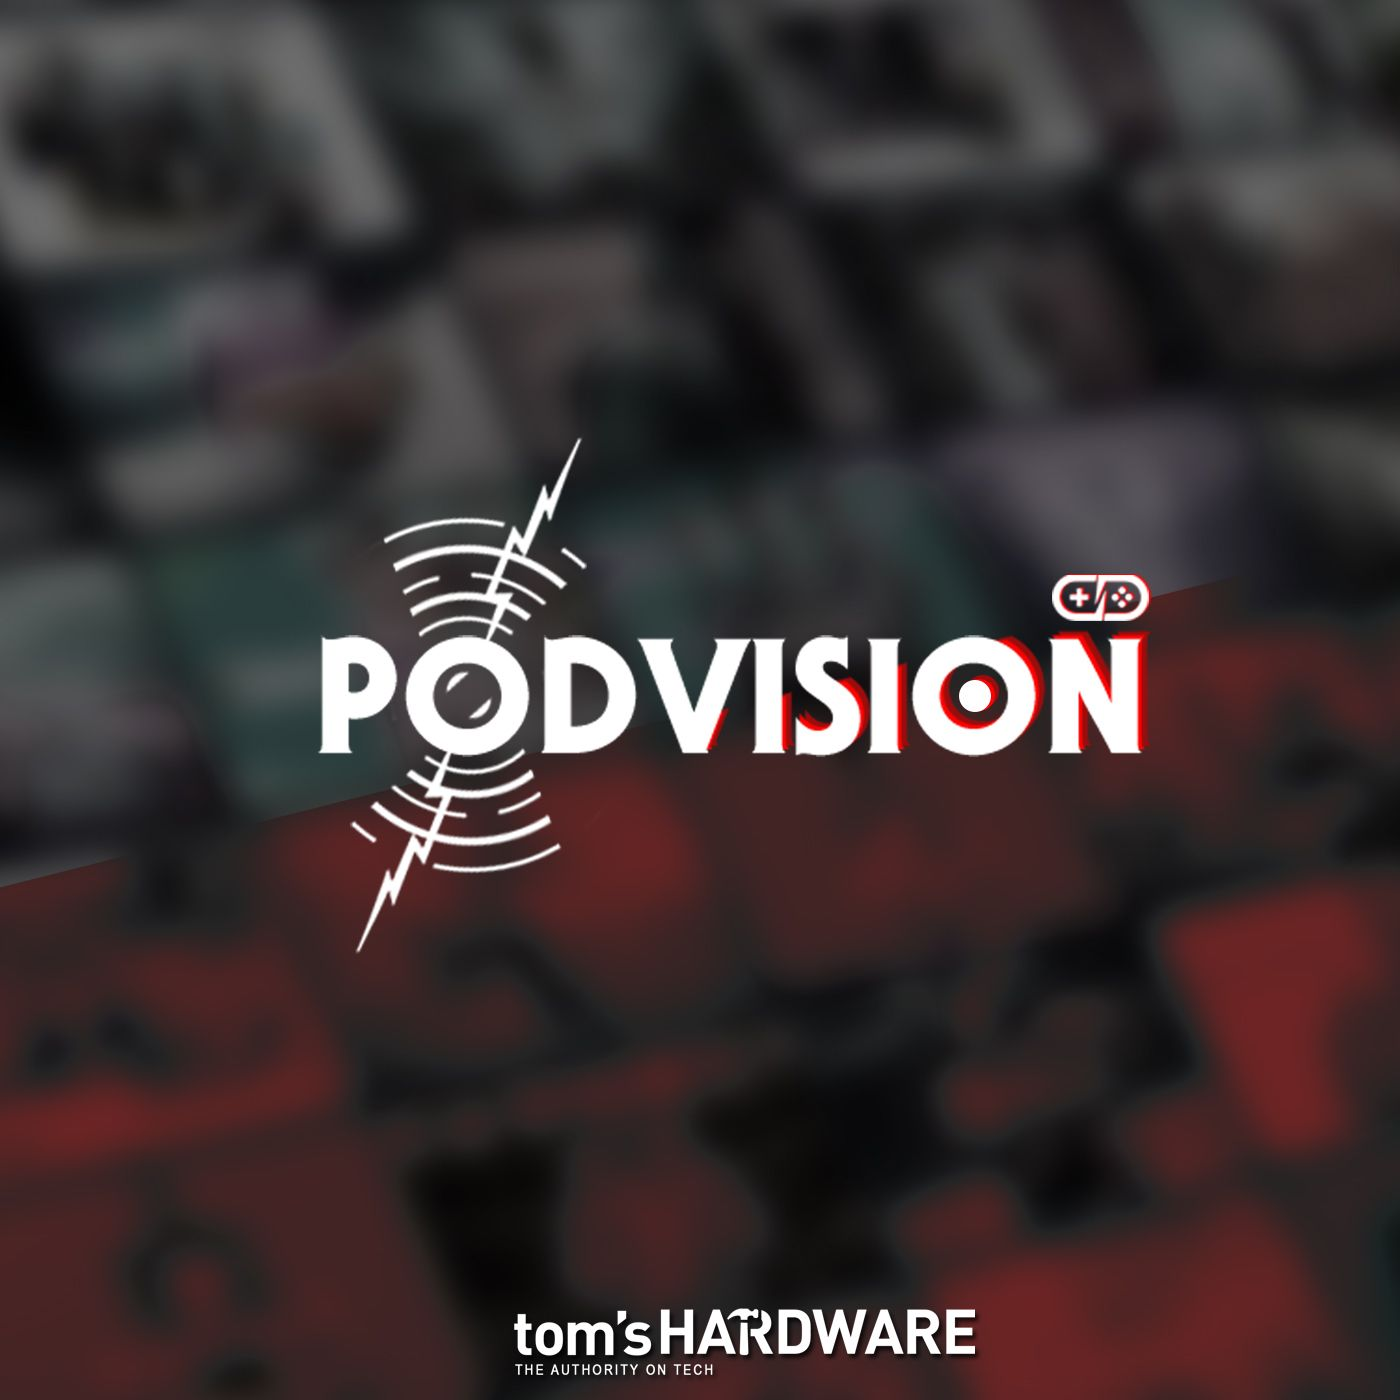 PoDvision